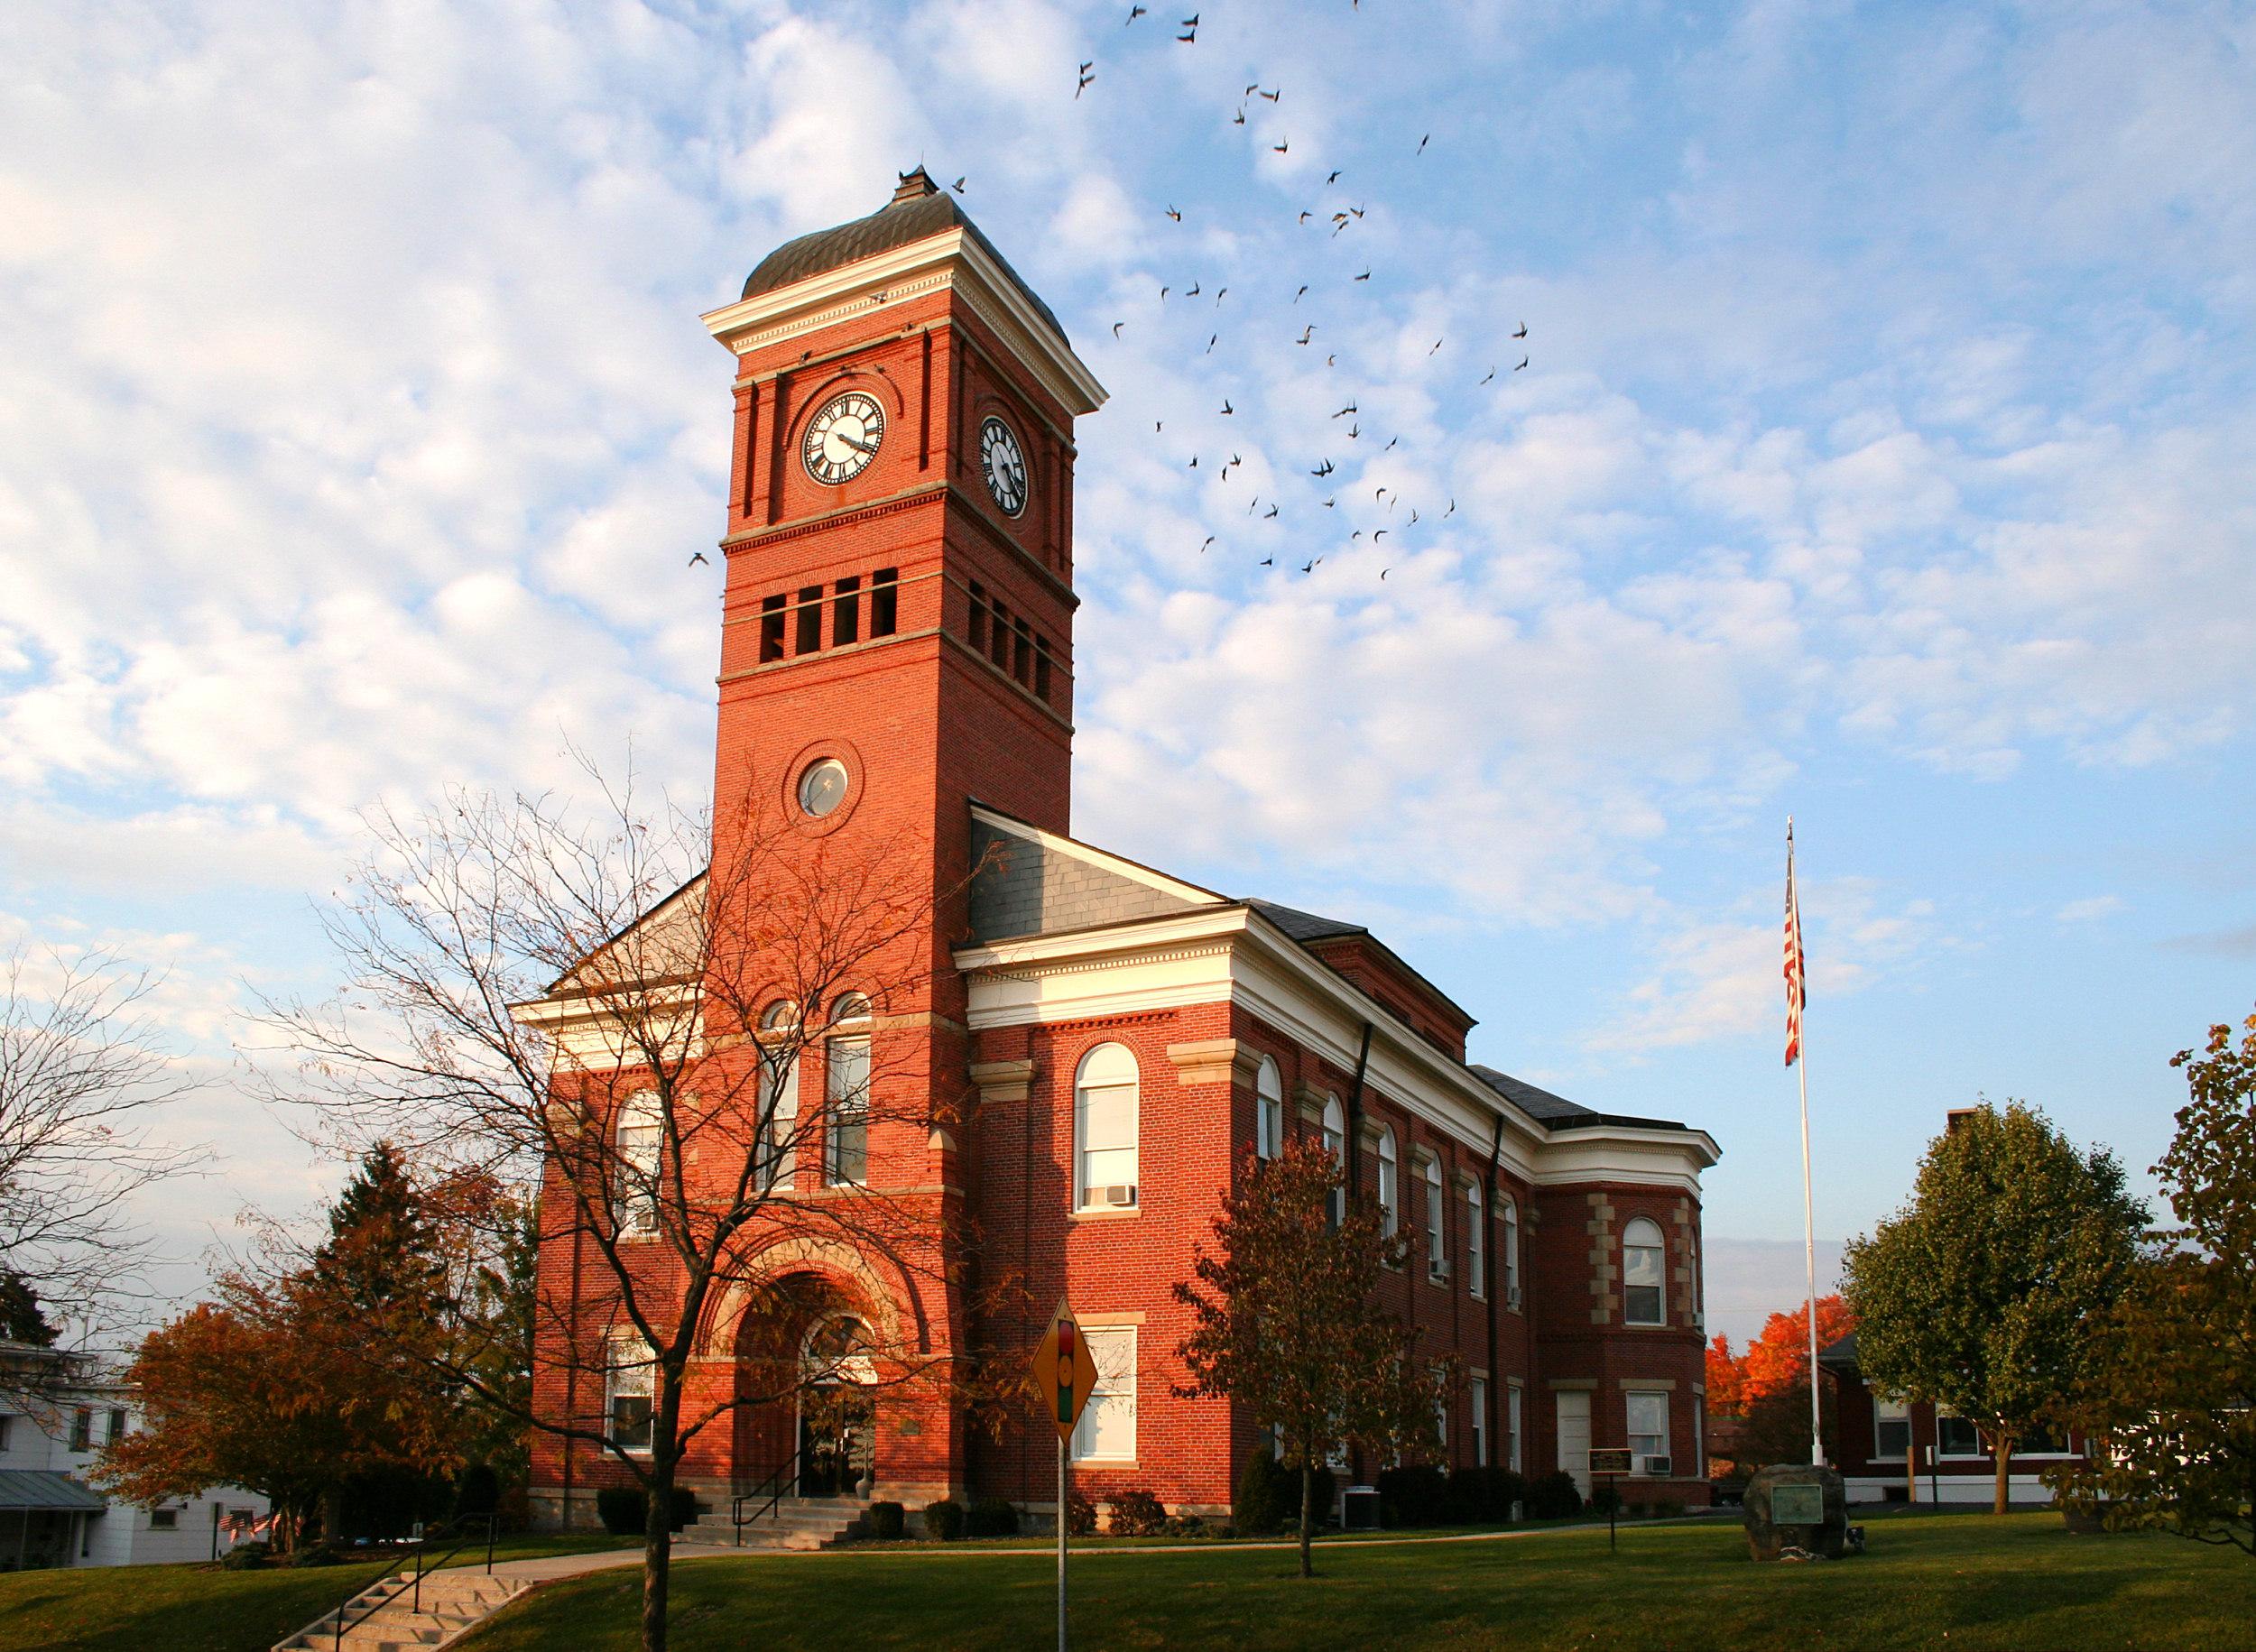 Ohio morrow county mount gilead - File Mount Gilead Ohio Courthouse Jpg